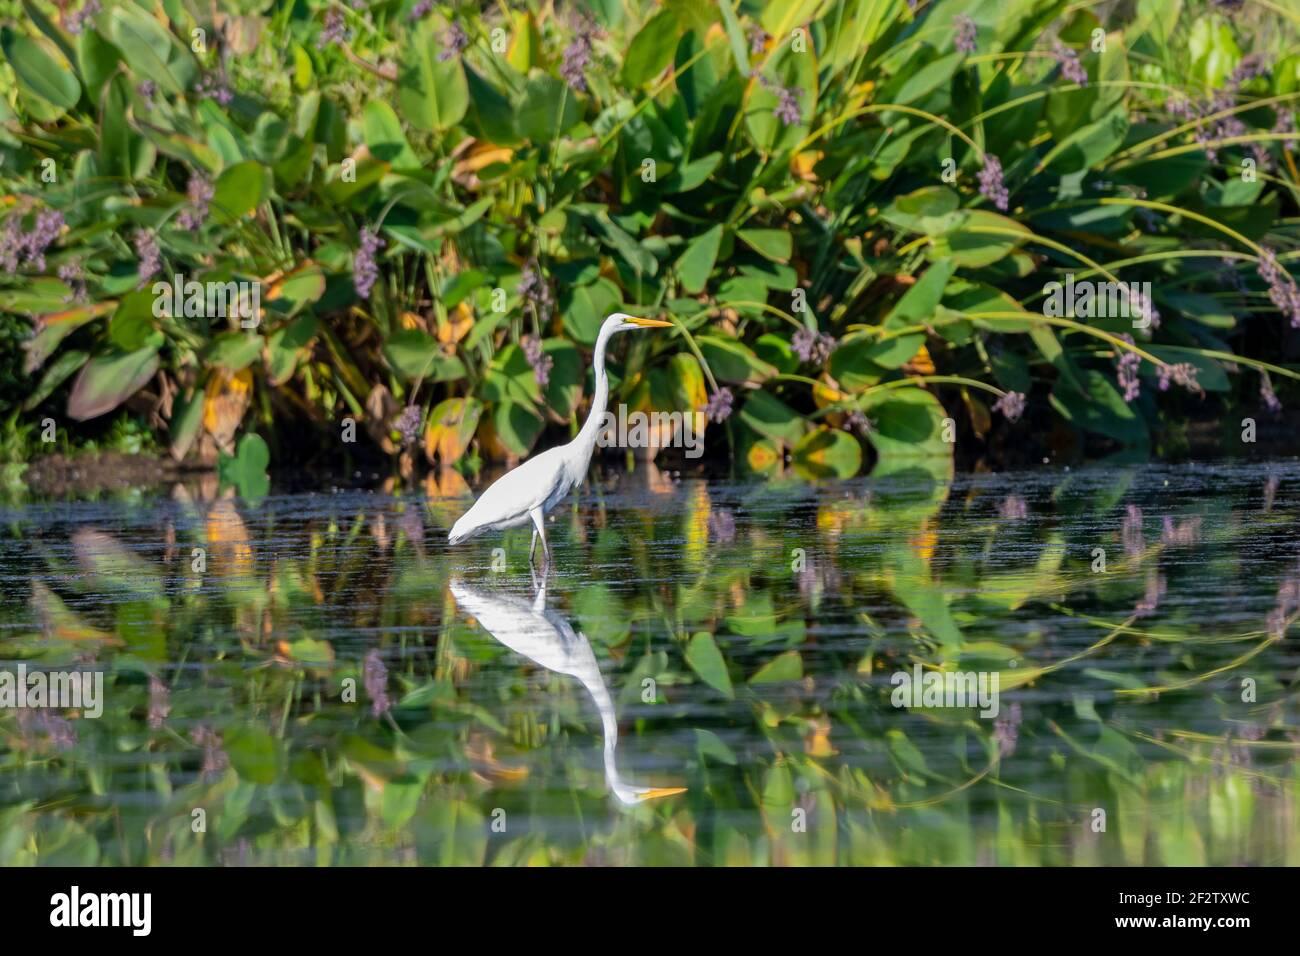 00688-03105 Gran Garza (Ardea alba) pesca cerca de Canna de agua (Canna glauca) en el humedal Marion Co.IL Foto de stock